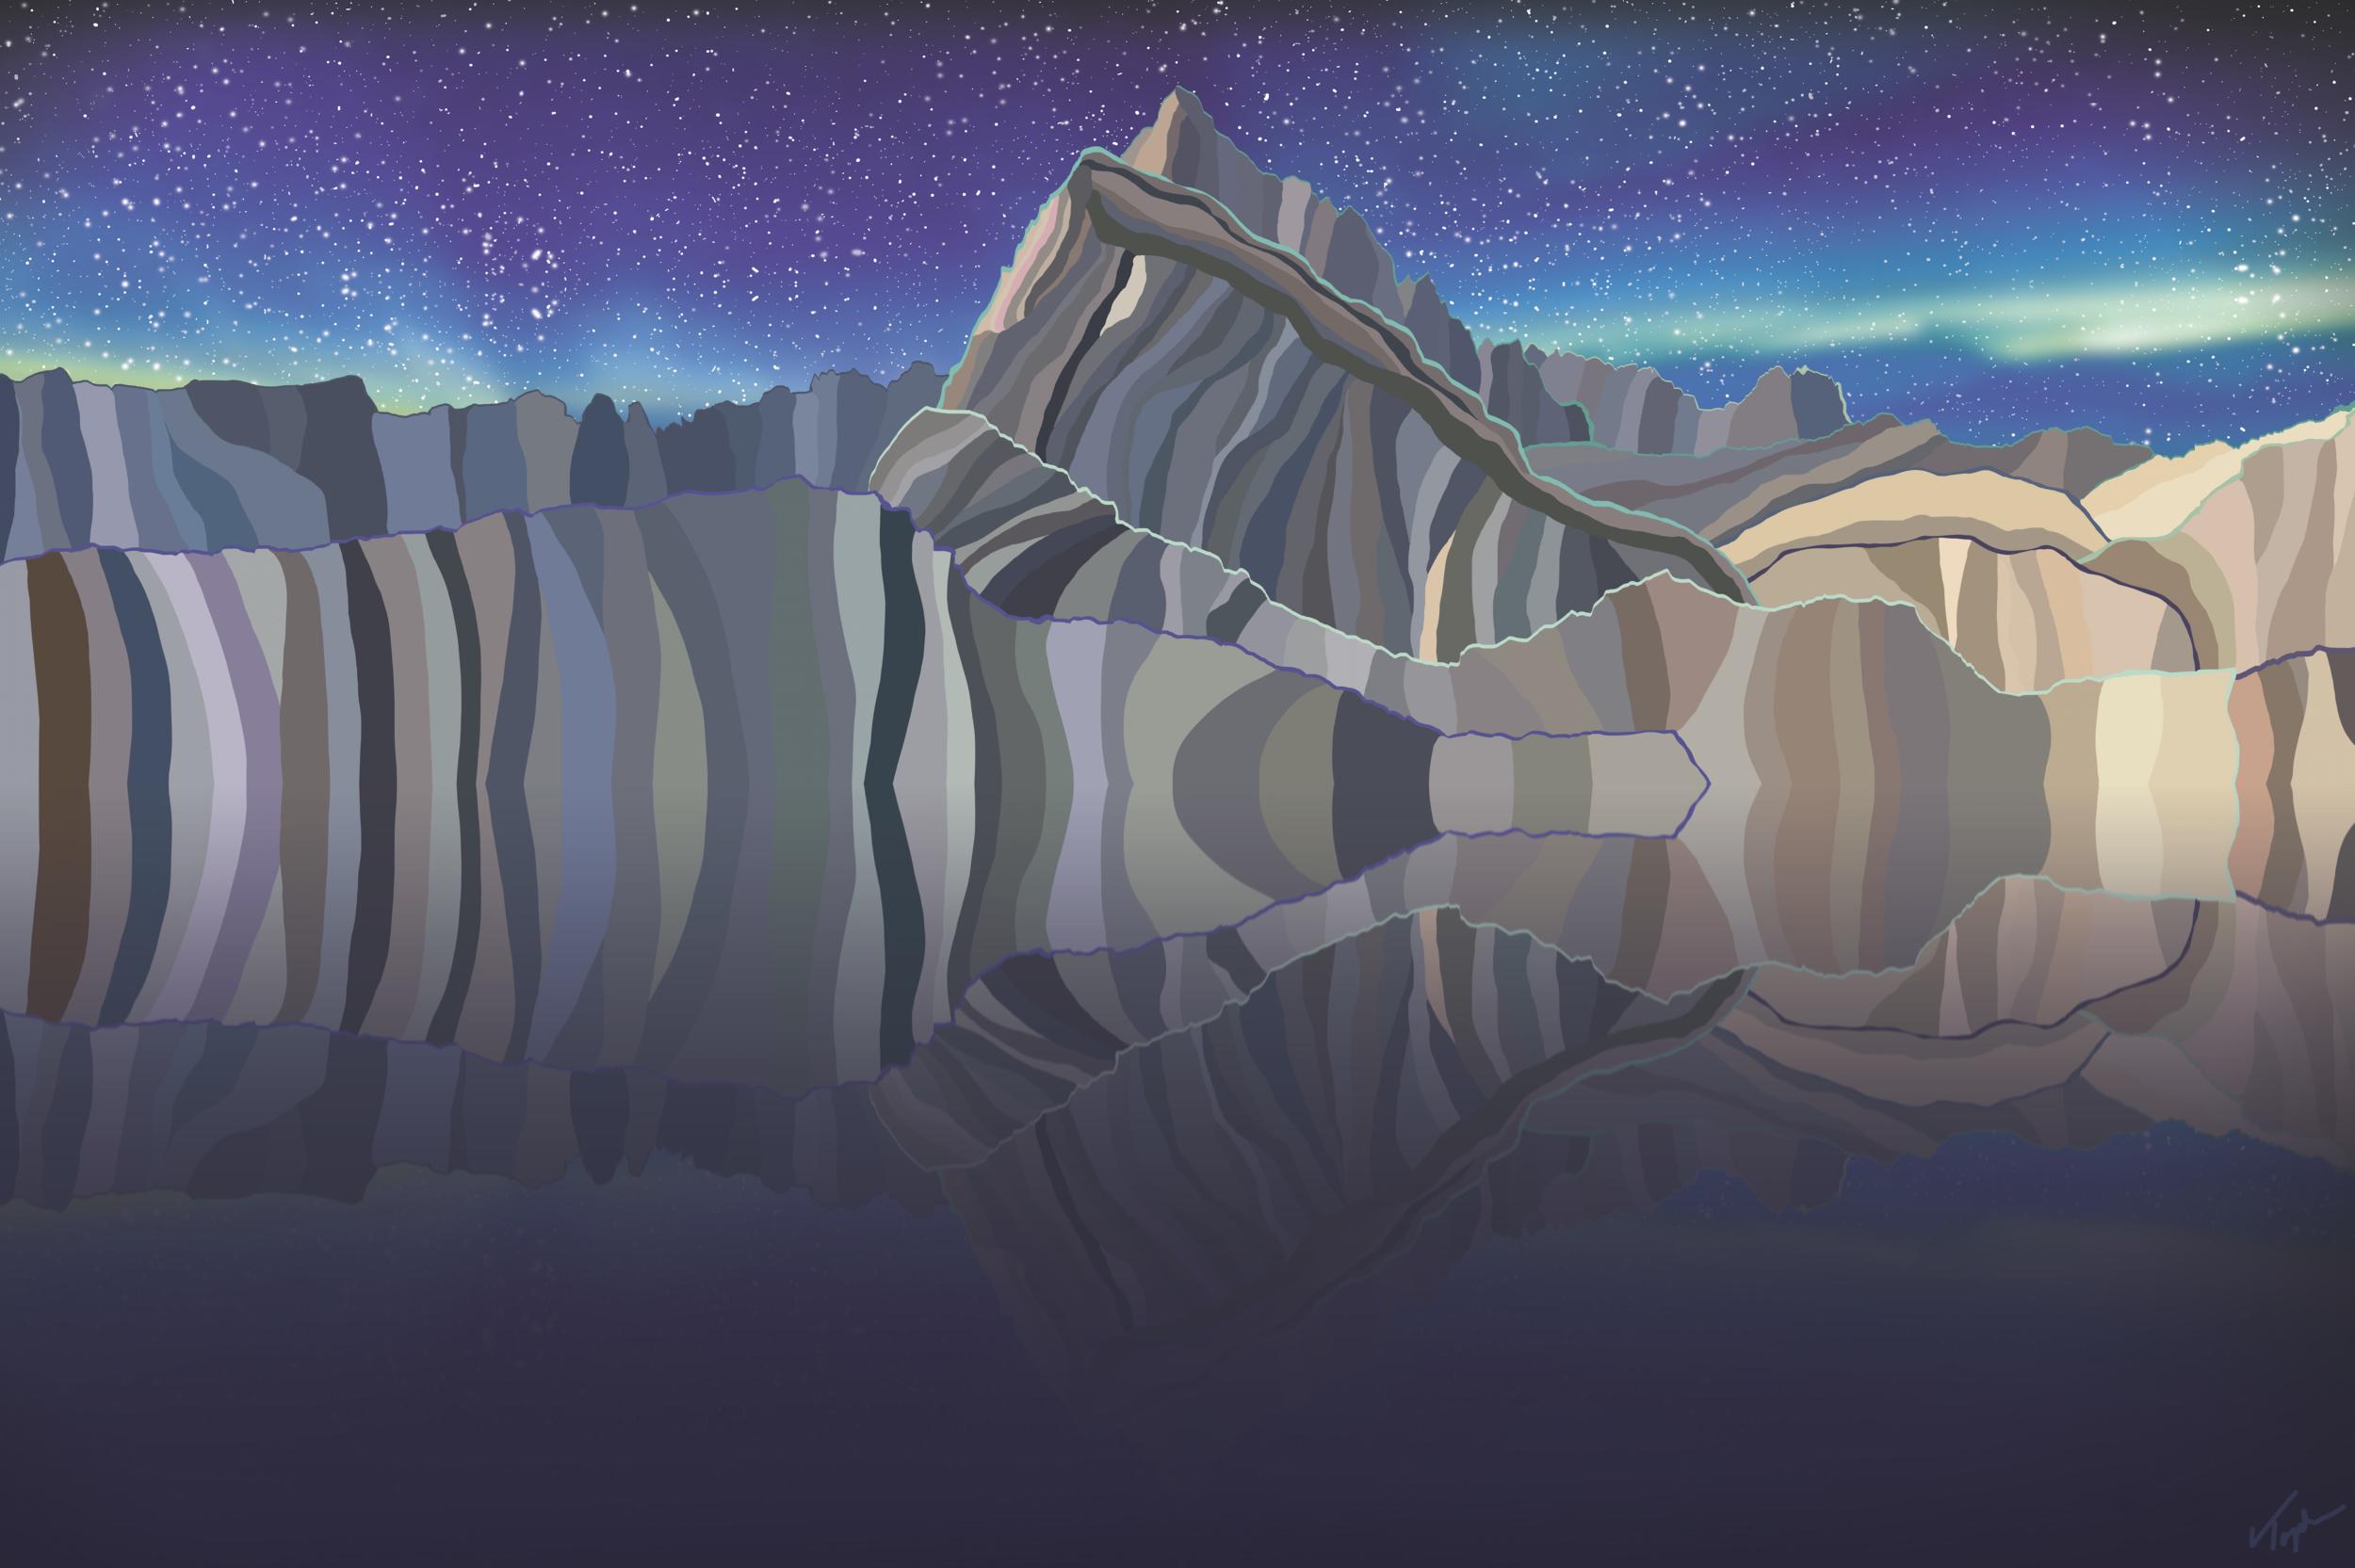 Mirror Lake  , 2019  Dye Sublimation on Aluminum   ORIGINAL   |   LIMITED EDITION   |   SOUVENIR